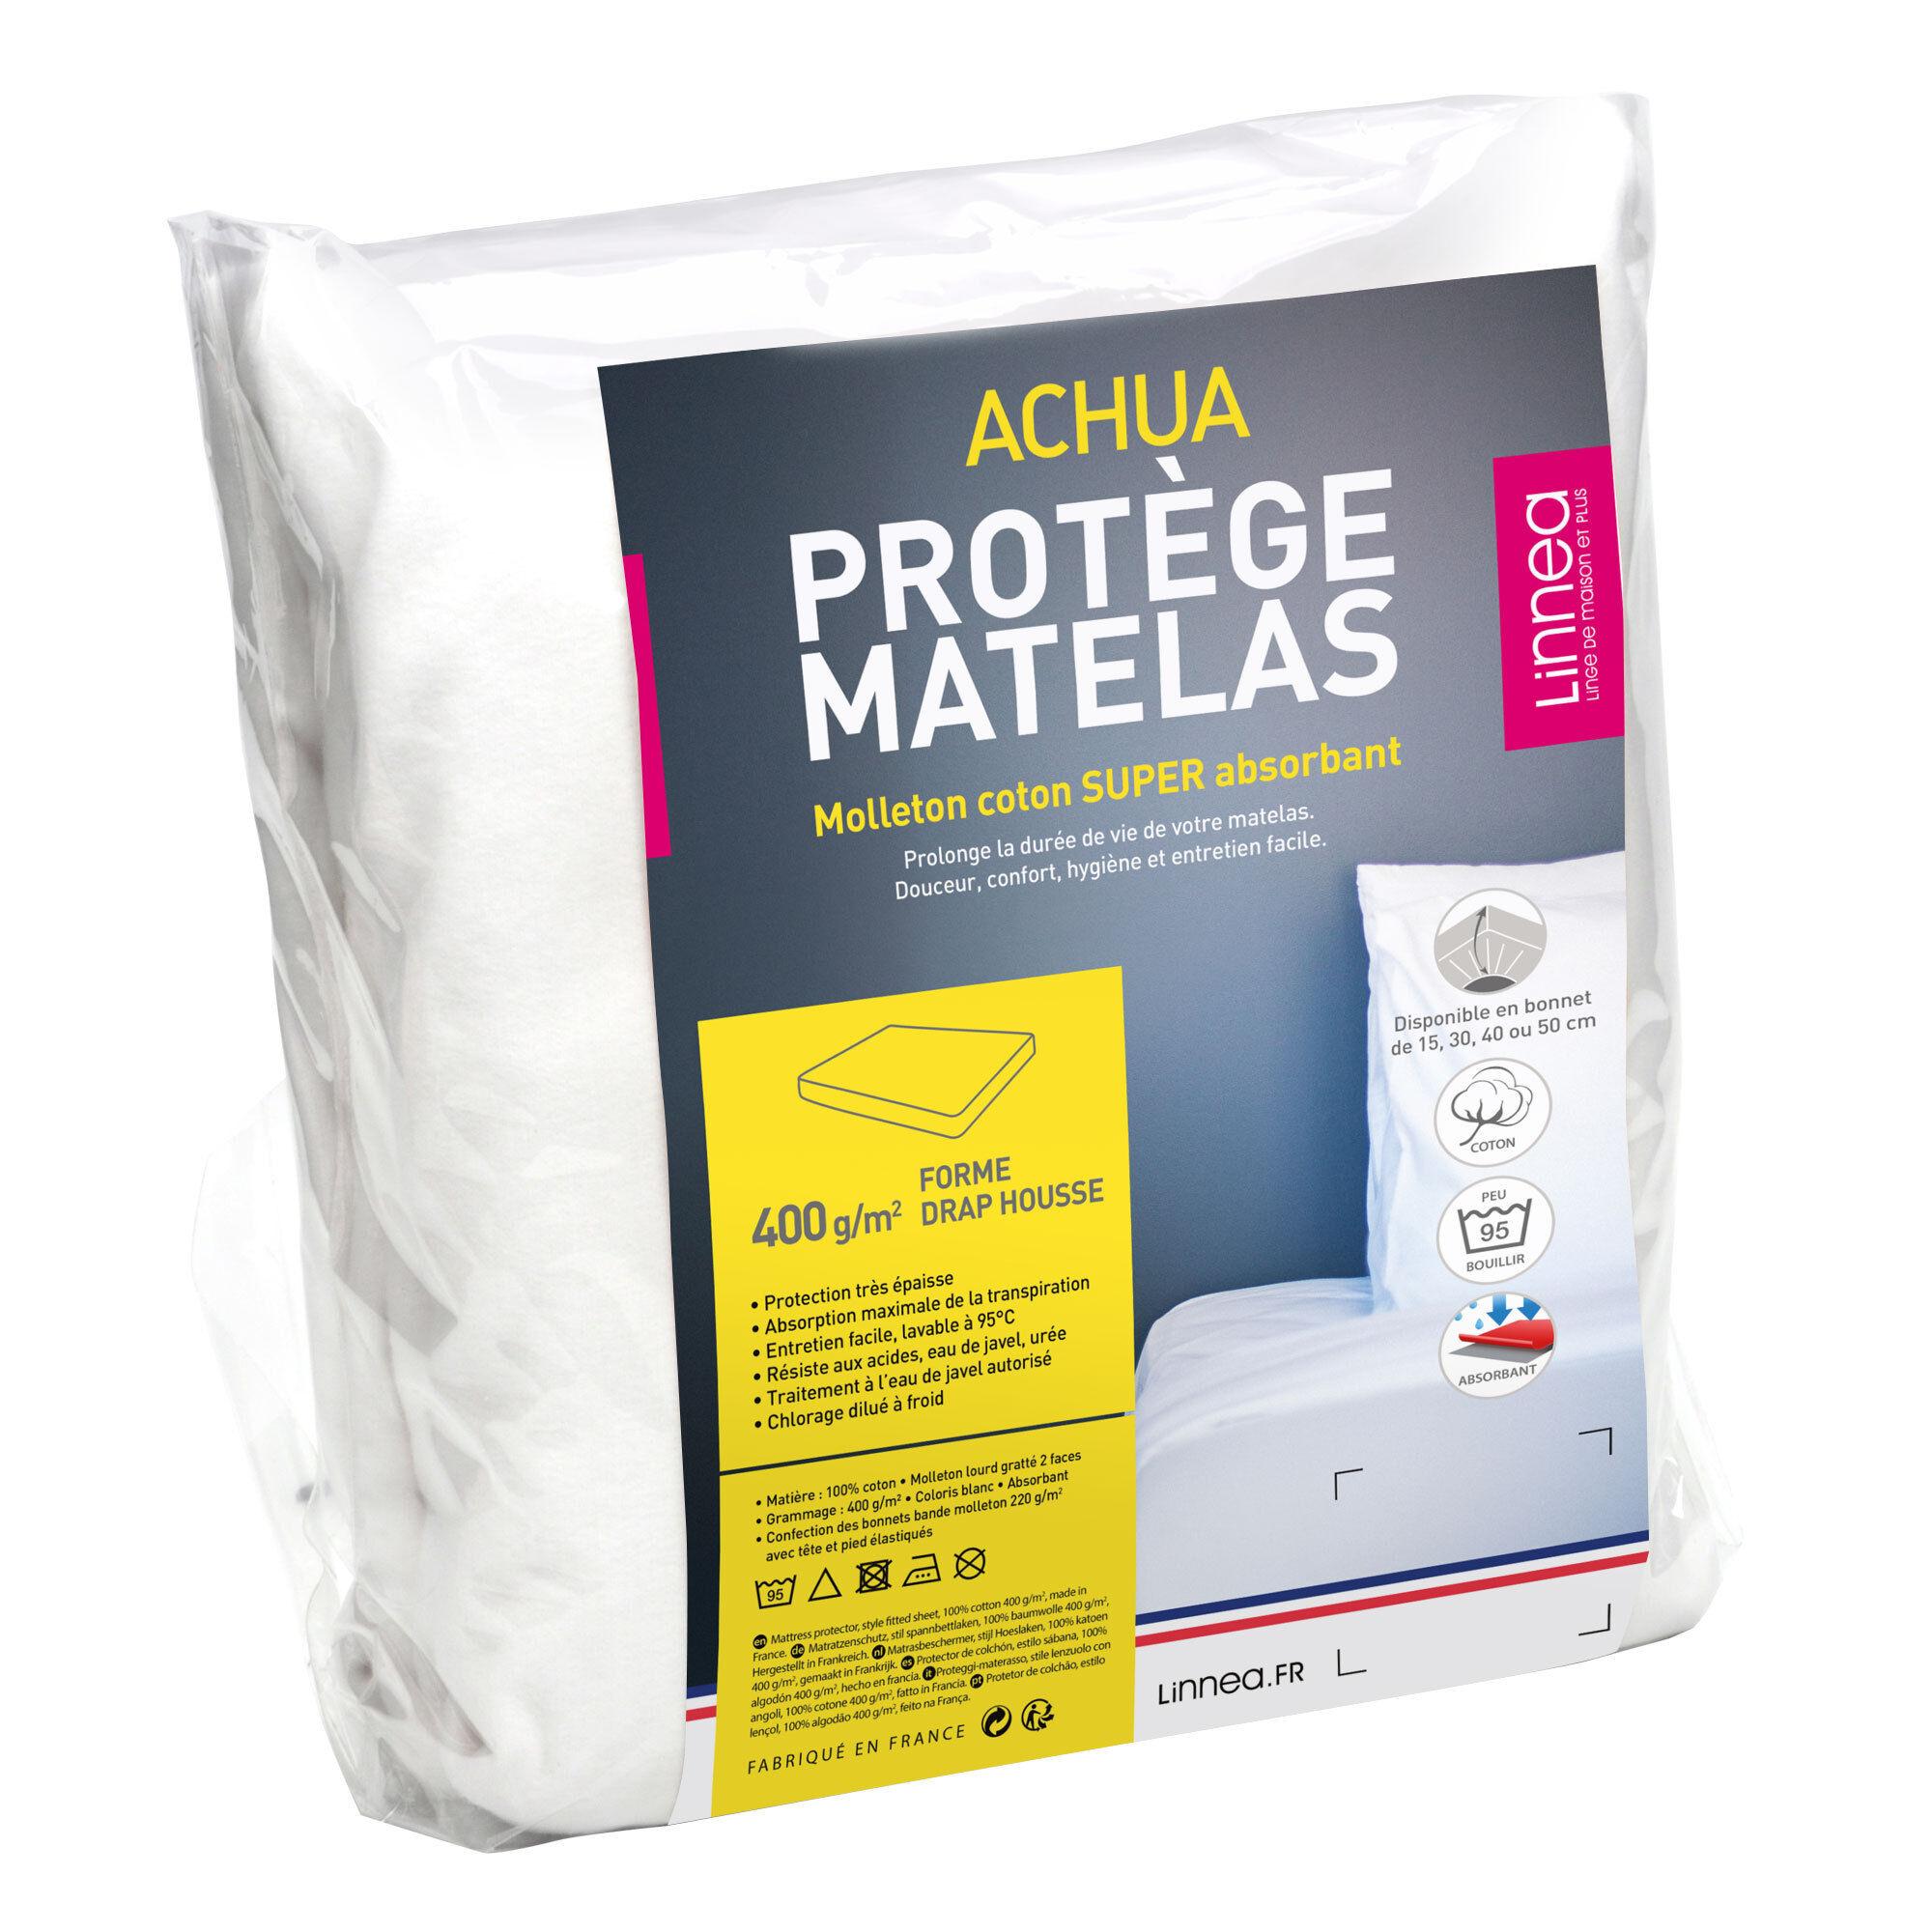 prot ge matelas 120x200 cm achua molleton 100 coton 400 g. Black Bedroom Furniture Sets. Home Design Ideas